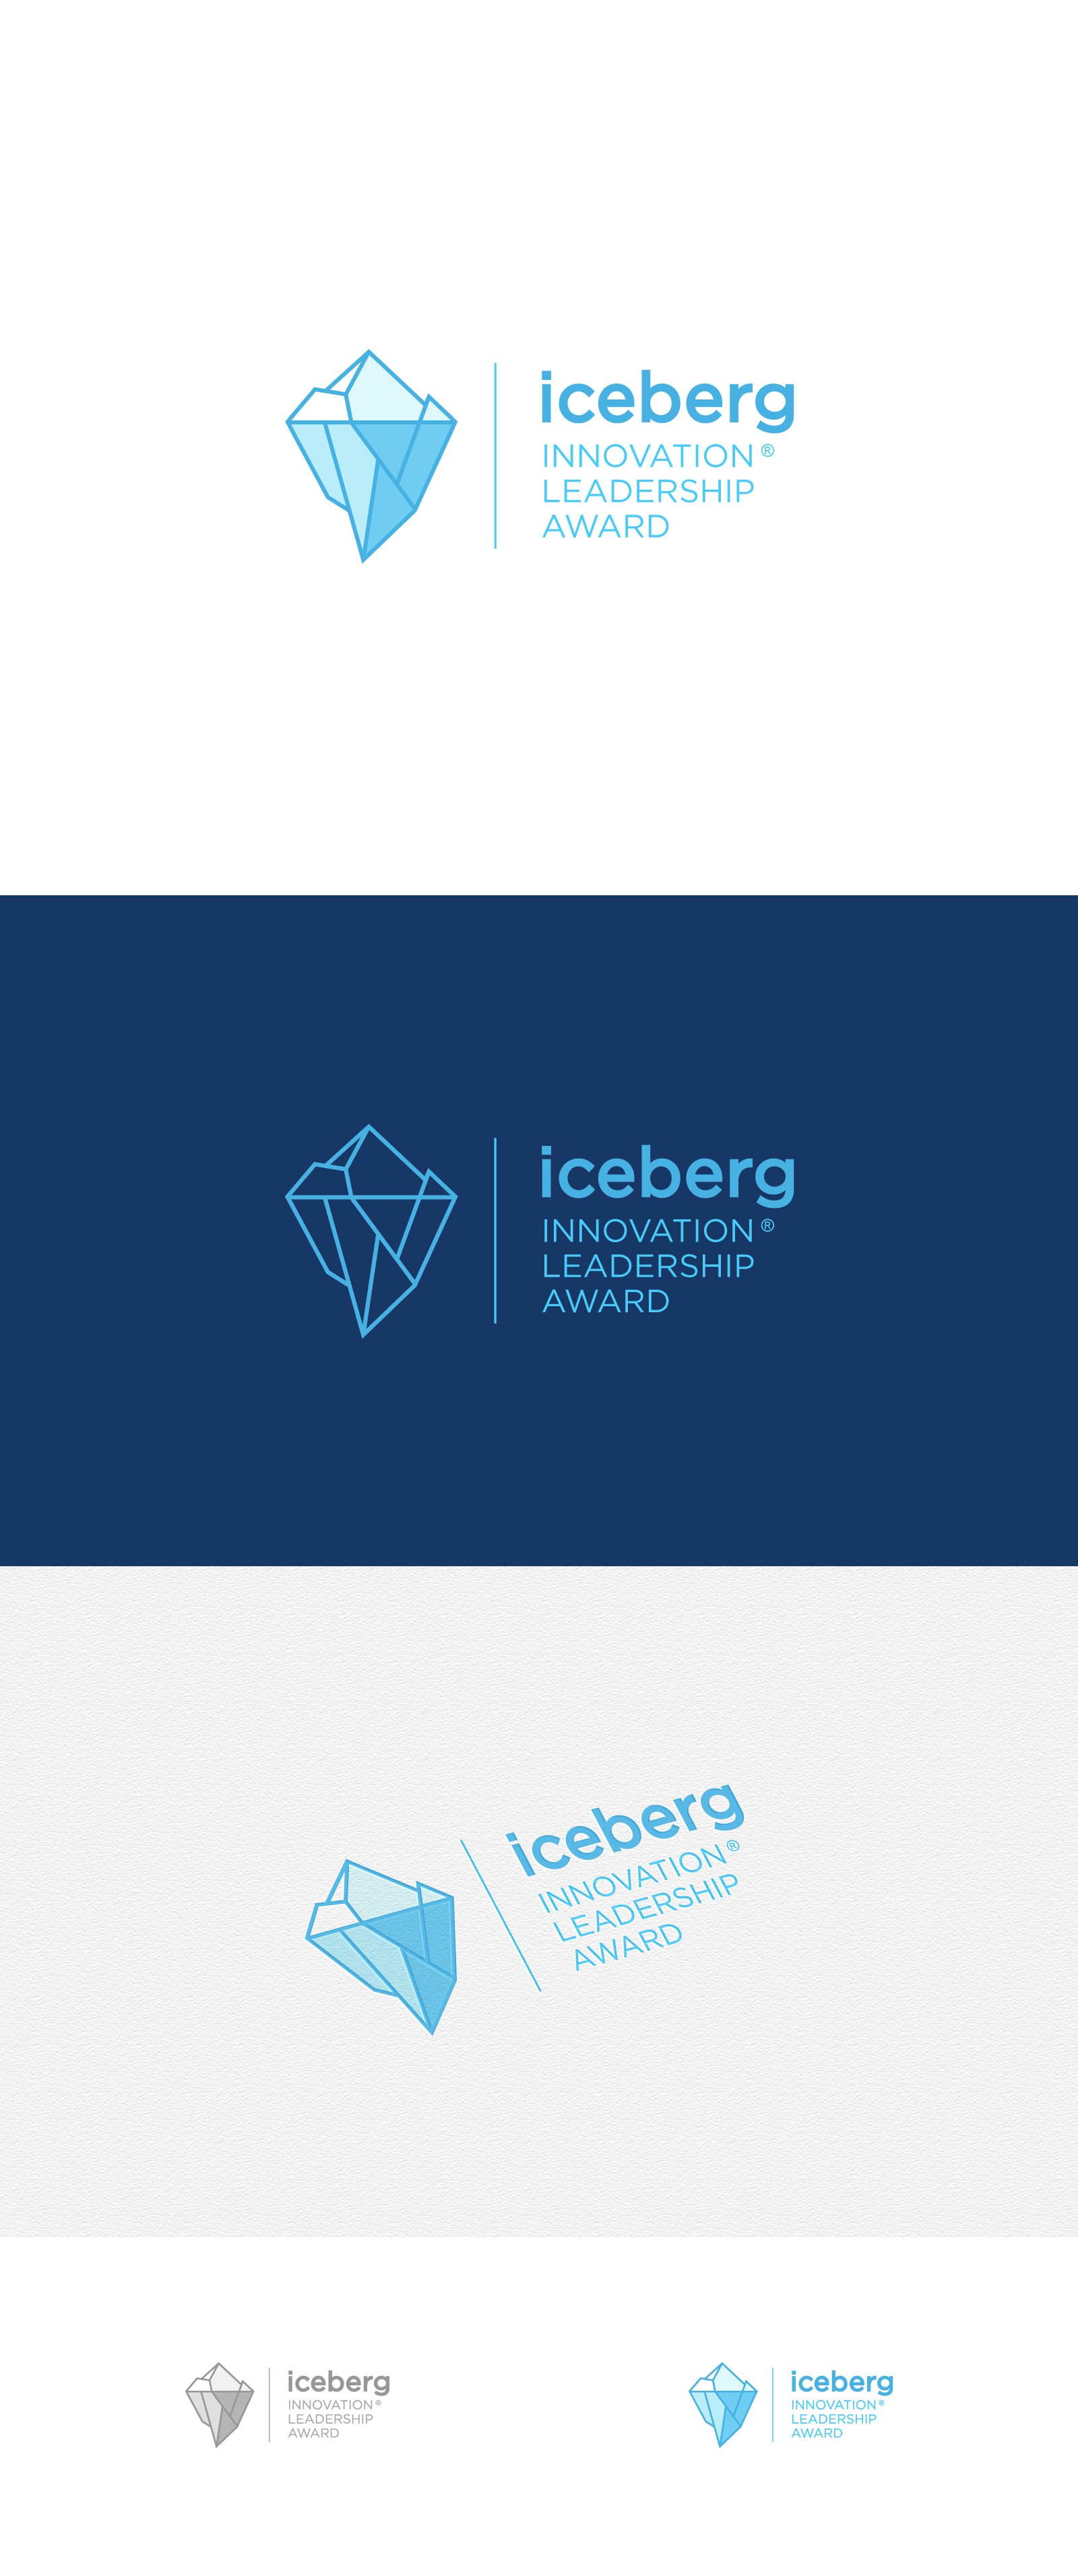 Create an awesome logo for ICEBERG Innovation Leadership Award